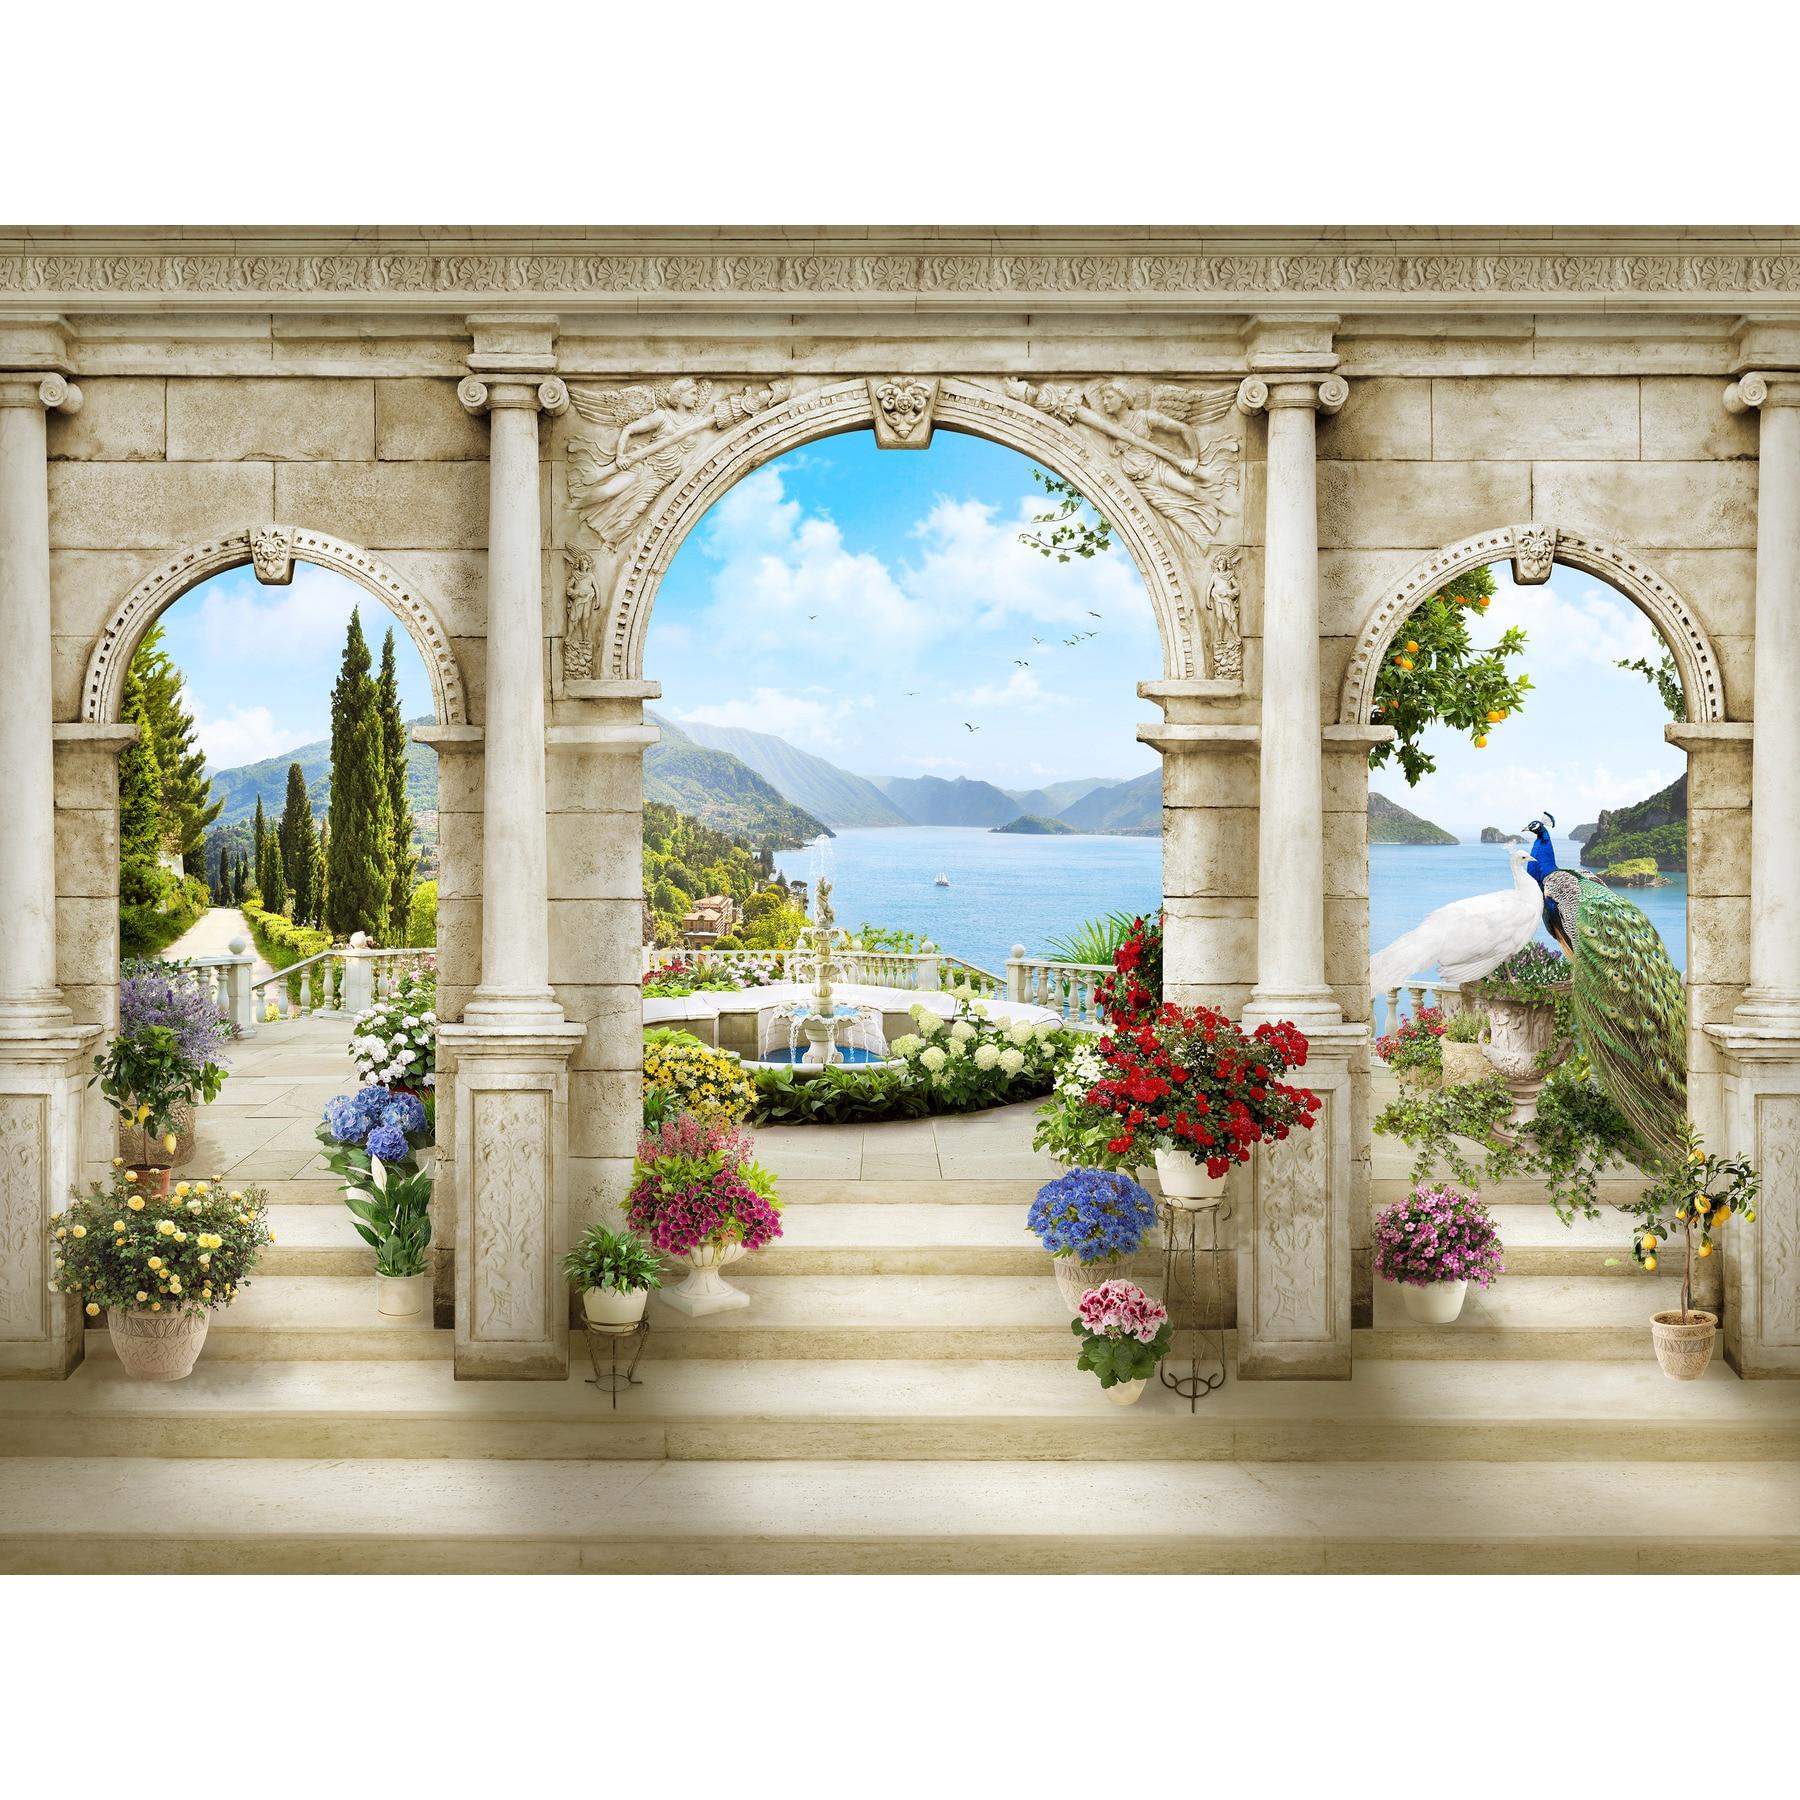 3D Photo Wallpaper Wallpaper Wall Mural, Wallpaper Custom, Hall, Kitchen, Bedroom, Children's, Photo Wallpaper Enhance Space